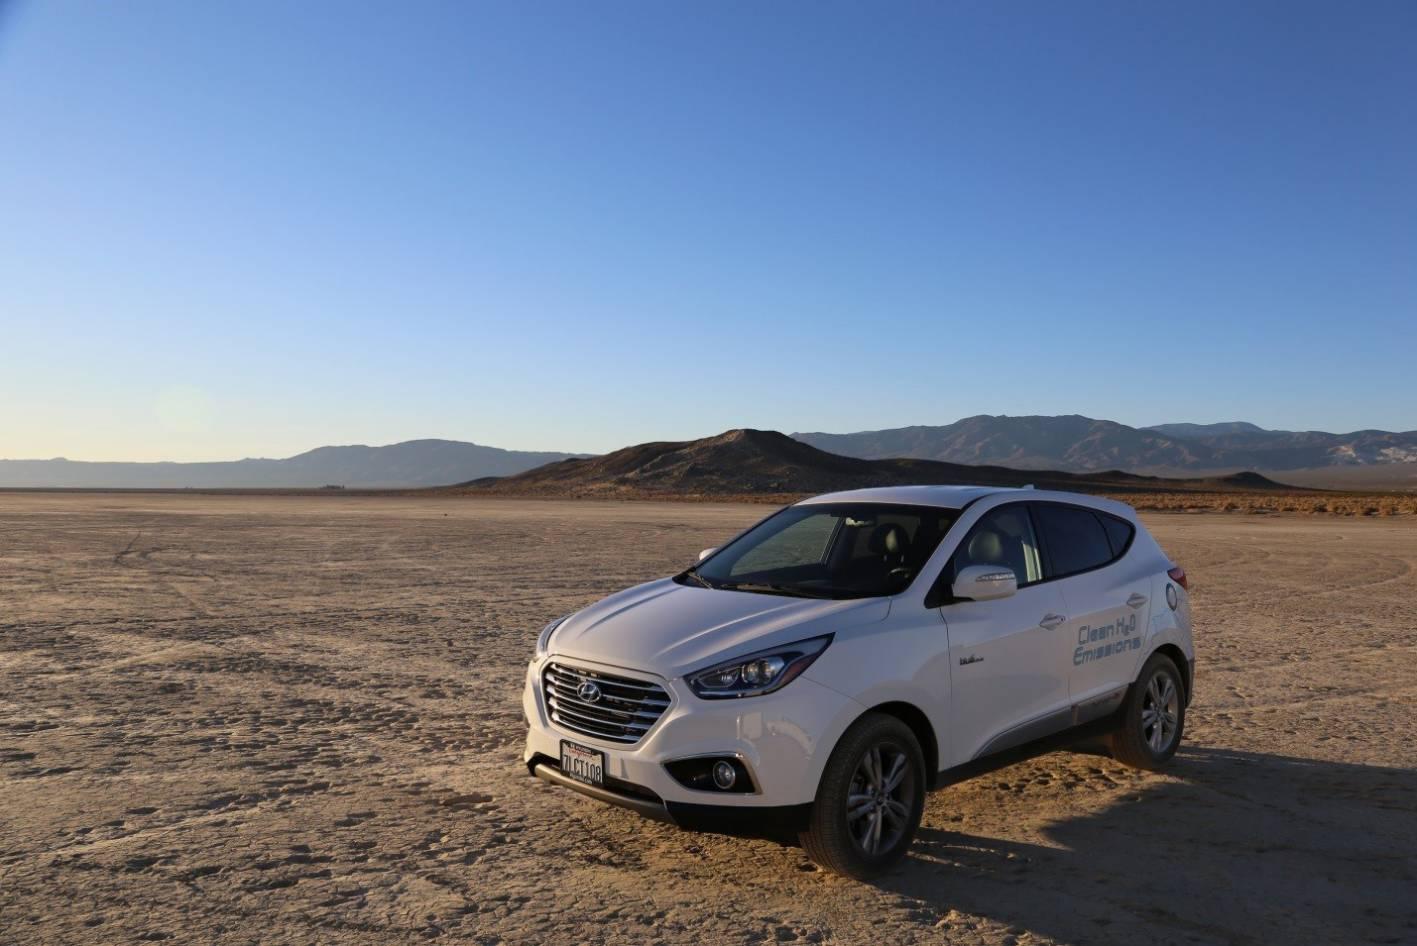 News Hyundai Ix35 Sets Land Speed Record